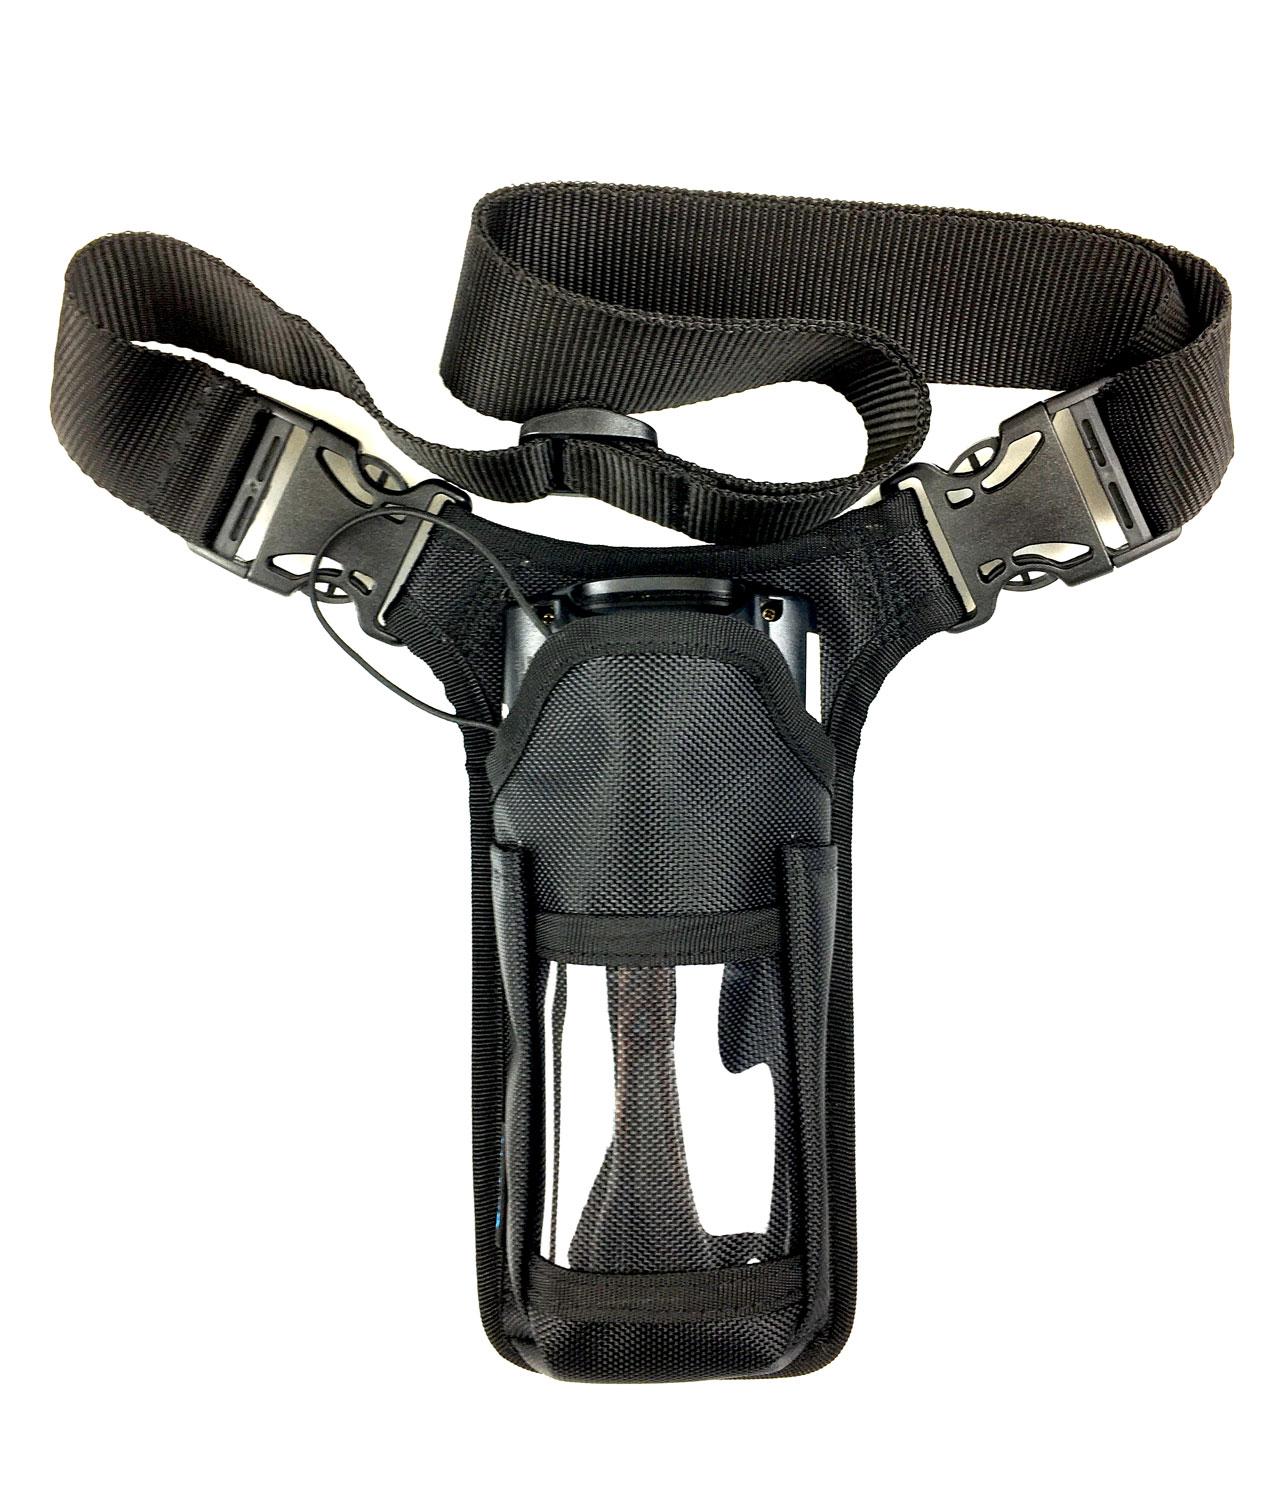 Soft fabric holster for Zebra МС 32N0